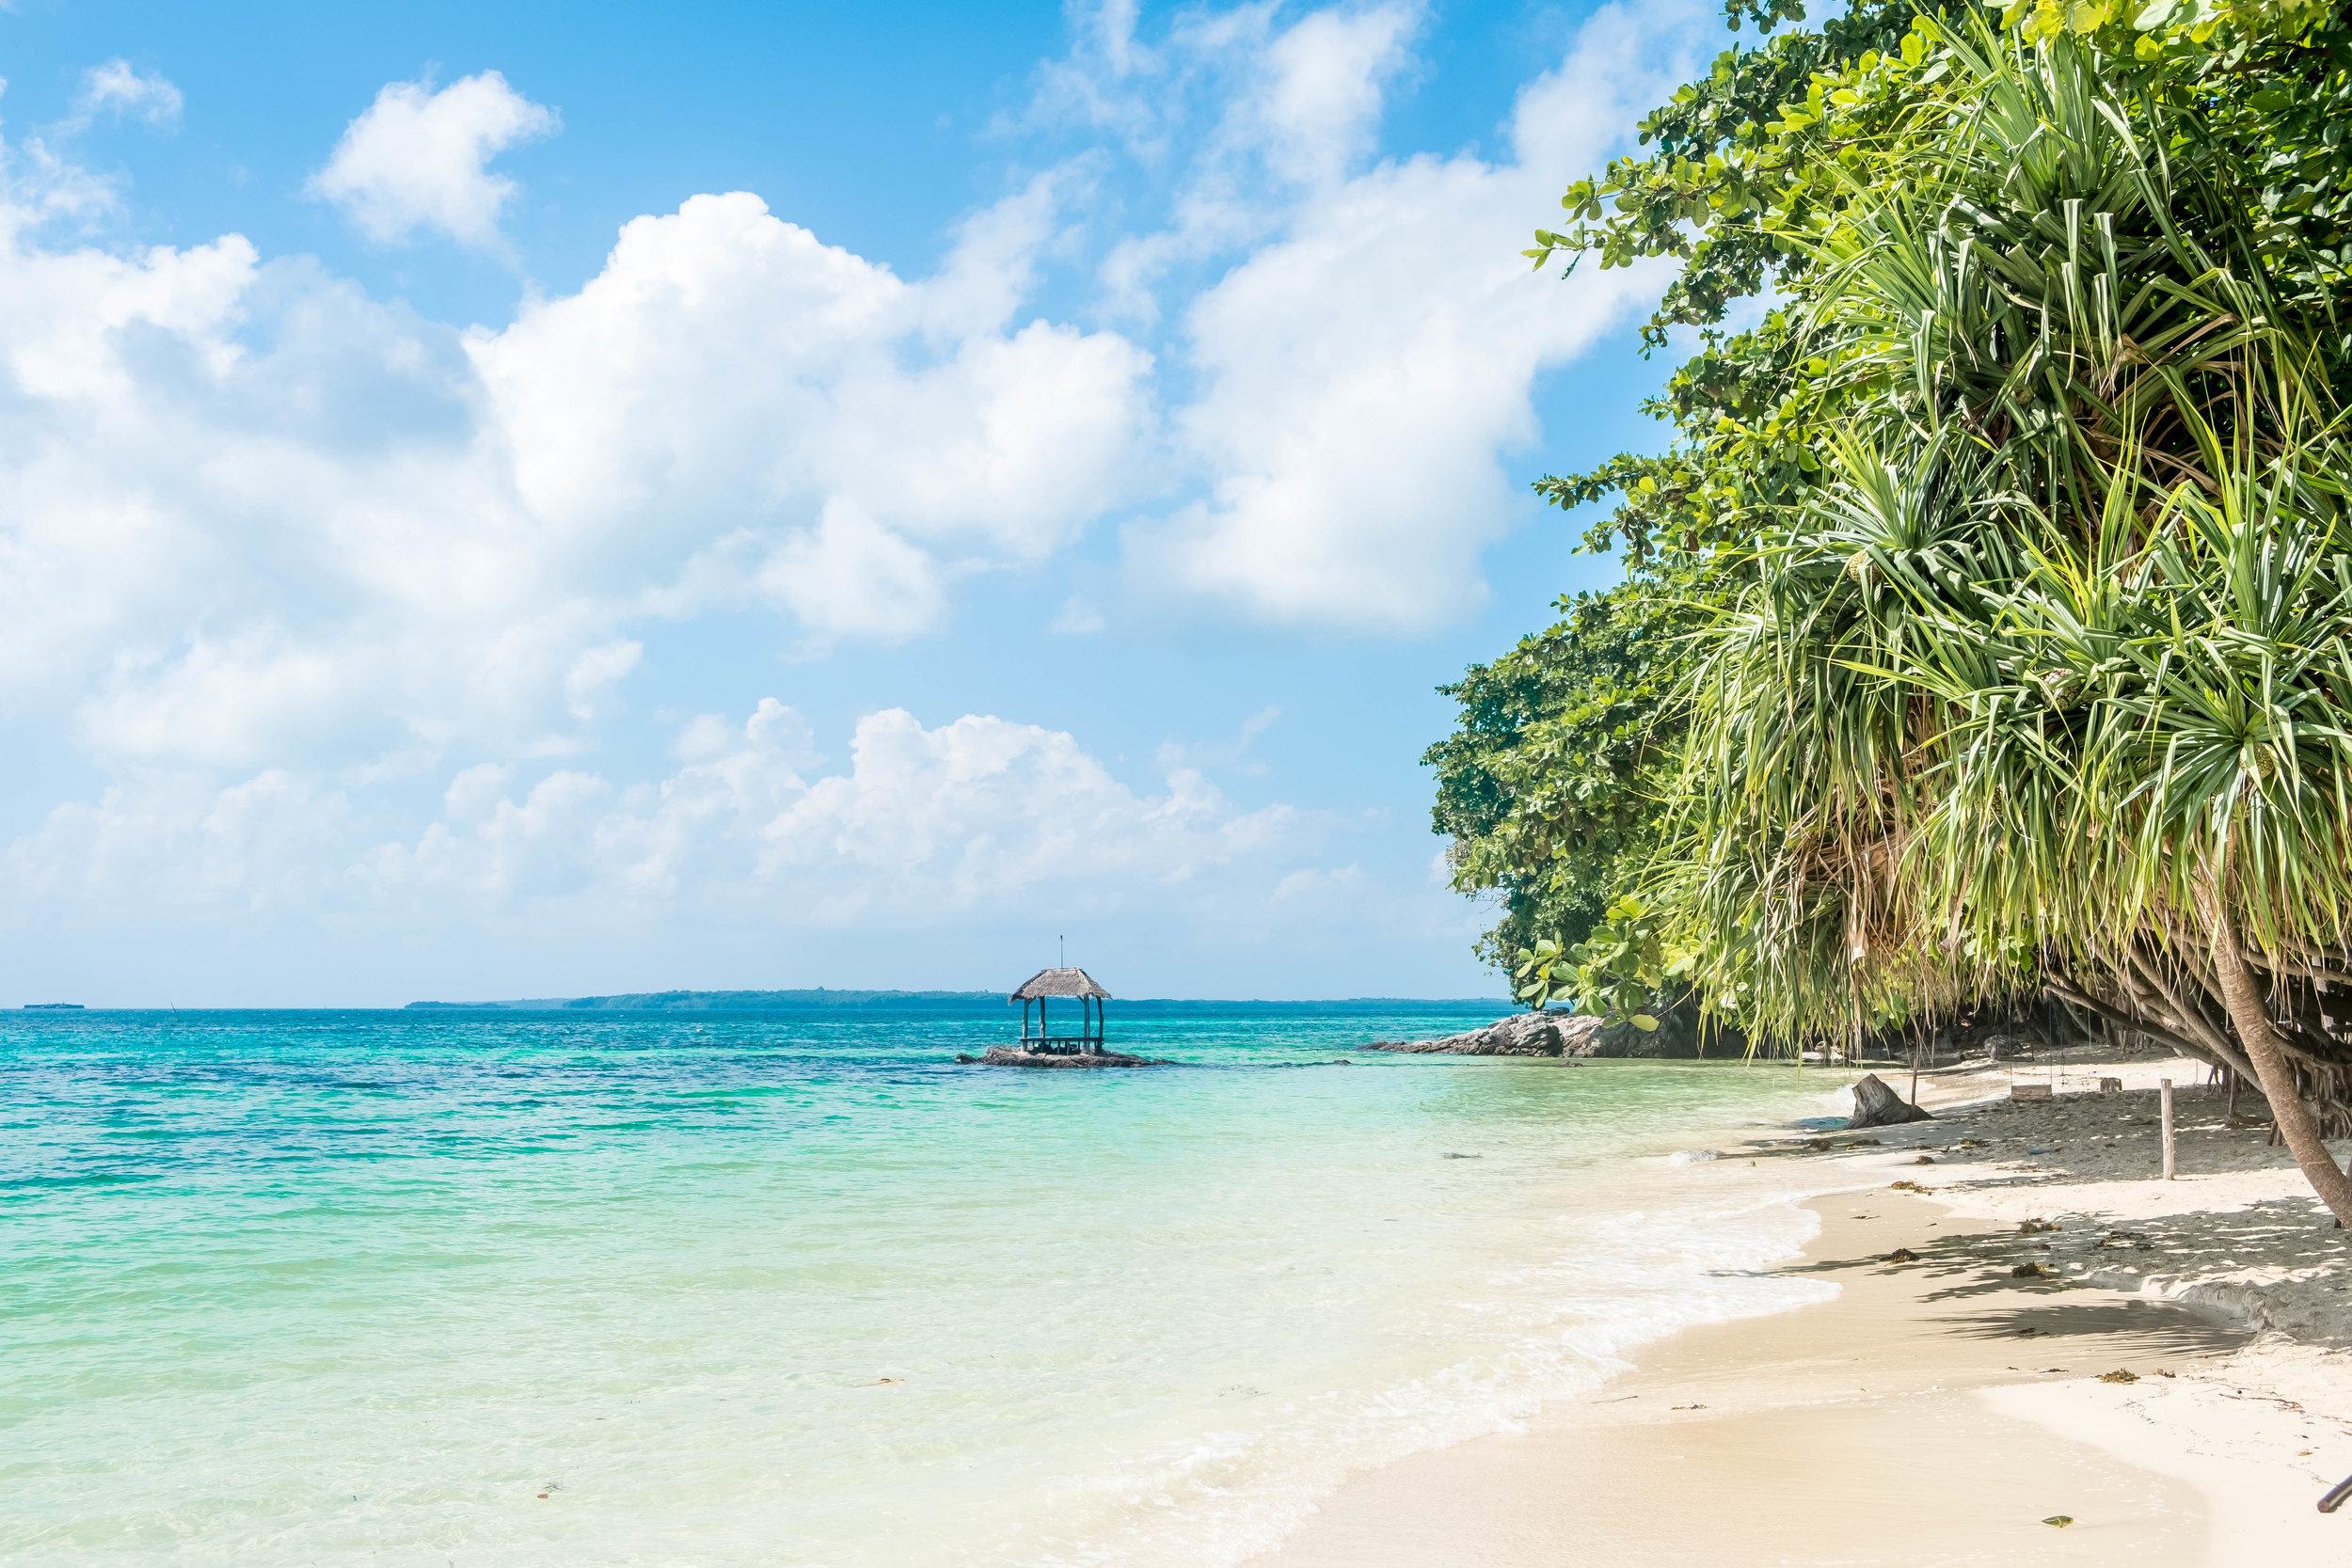 Private beach paradise